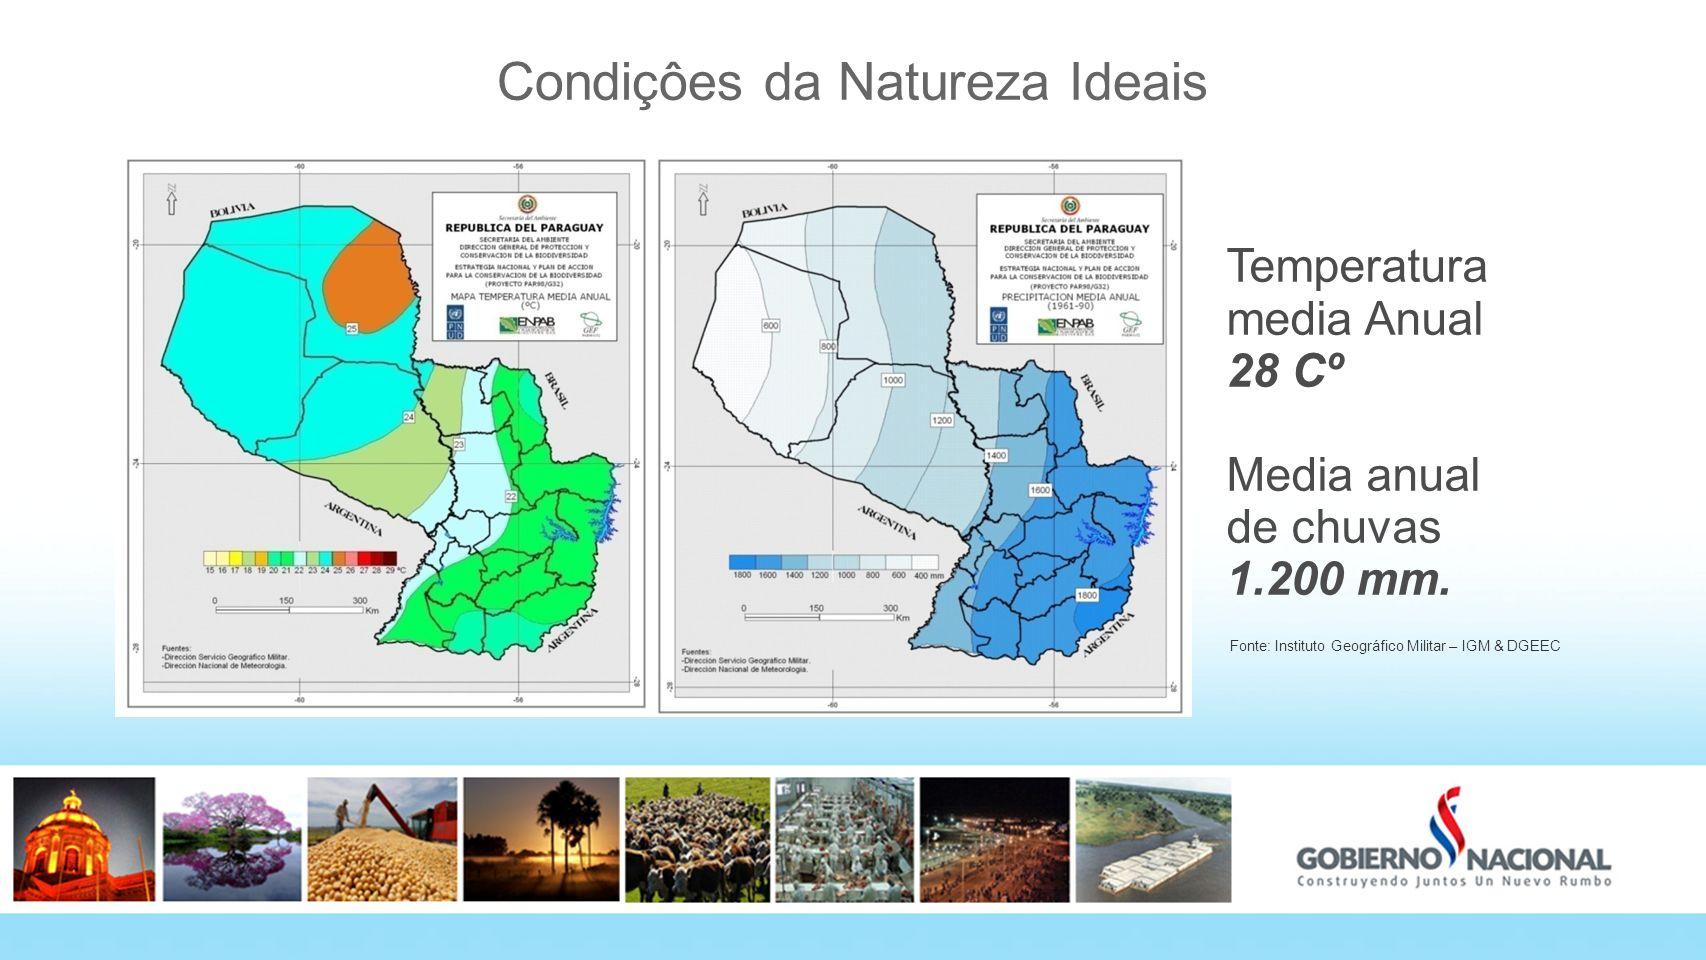 Condiçôes da Natureza Ideais Temperatura media Anual 28 Cº Media anual de chuvas 1.200 mm. Fonte: Instituto Geográfico Militar – IGM & DGEEC